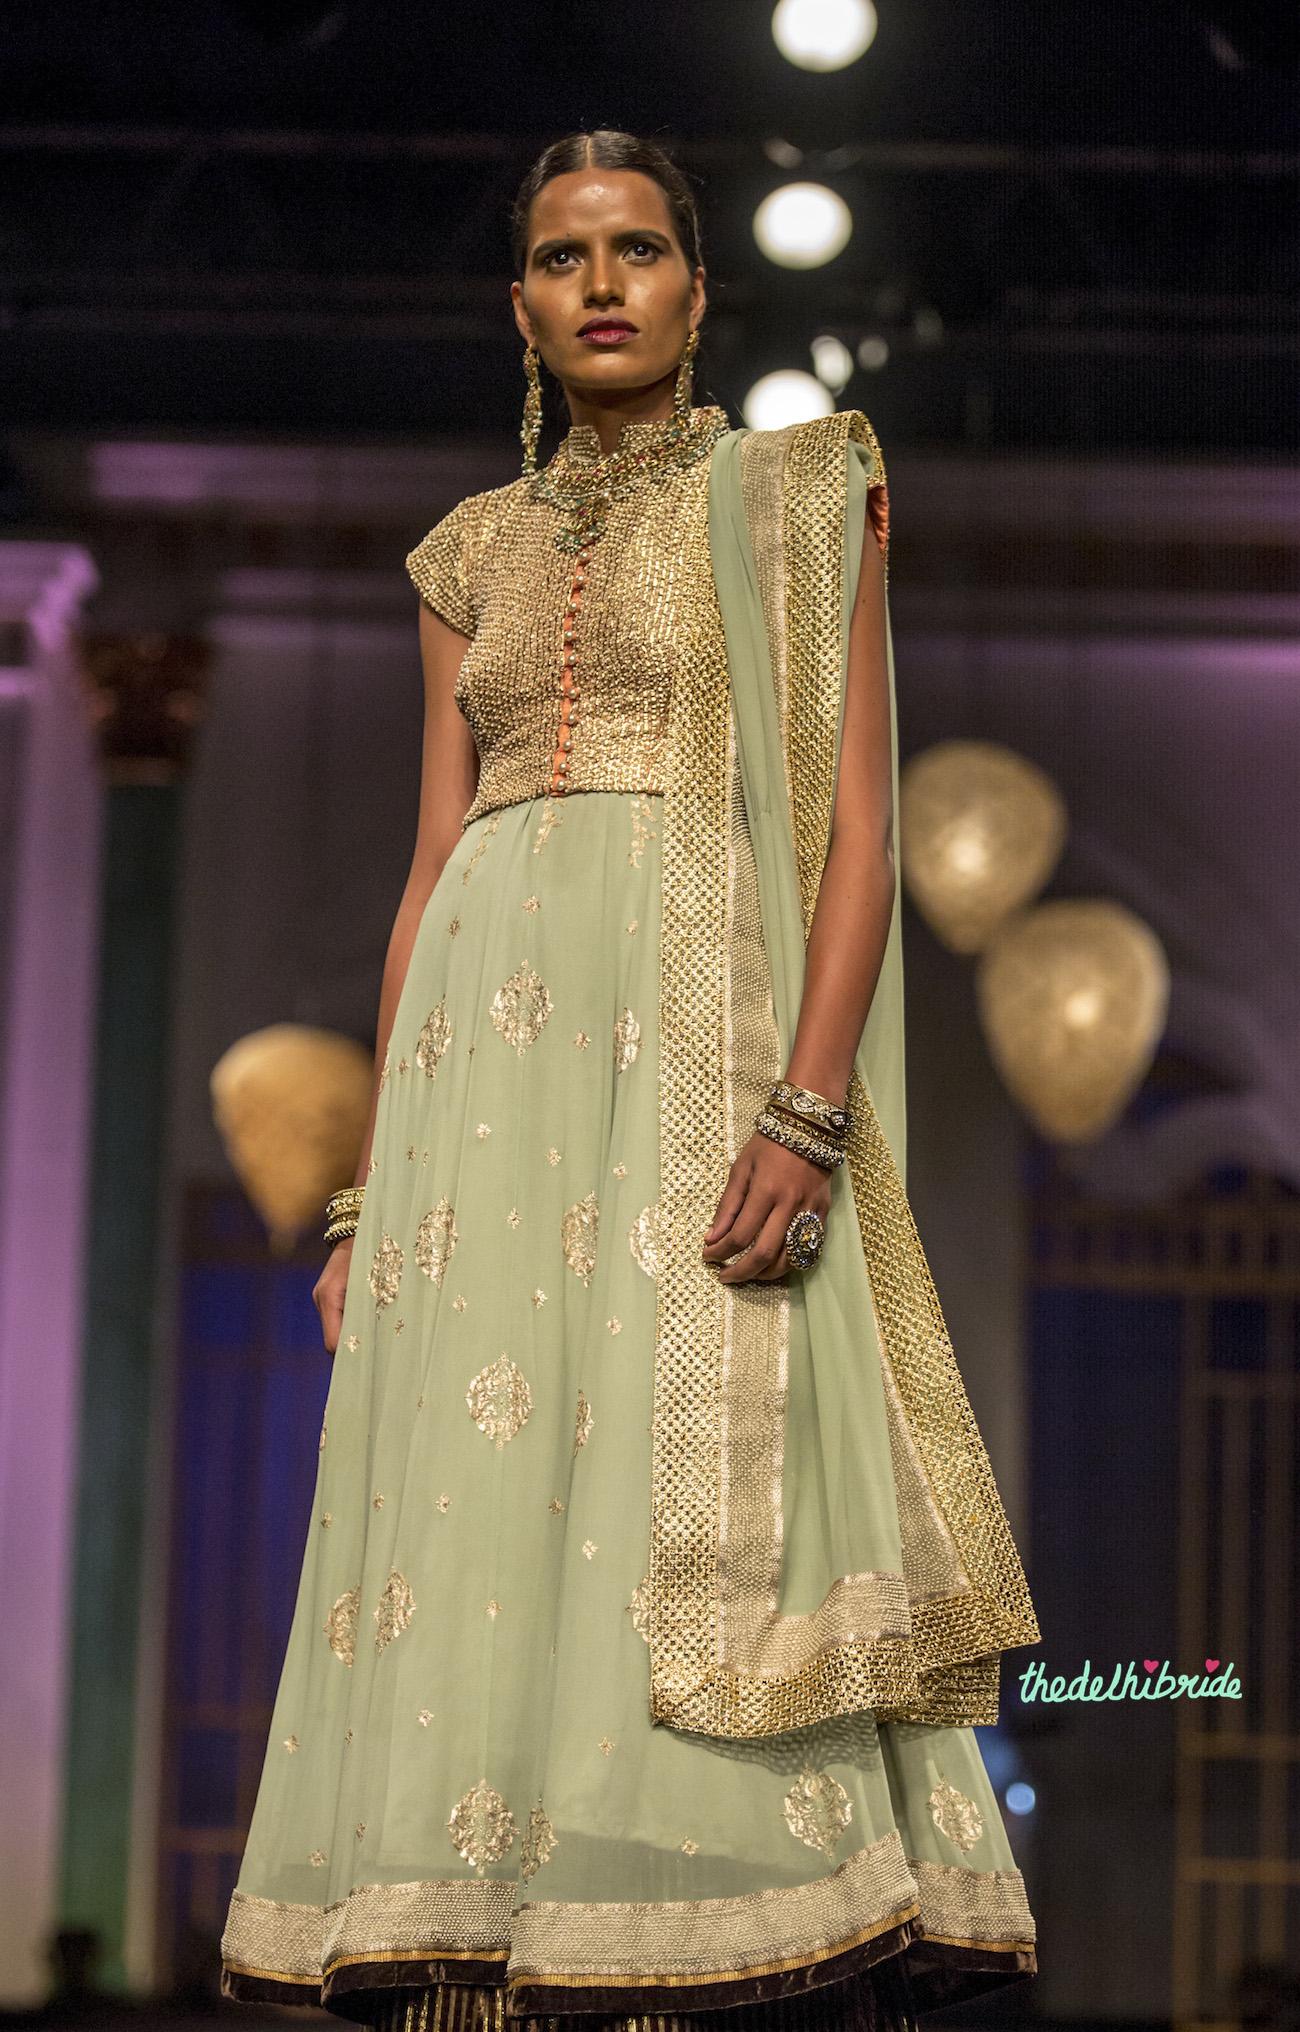 Meera Muzaffar Ali At India Bridal Fashion Week 2014 An Indian Wedding Blog